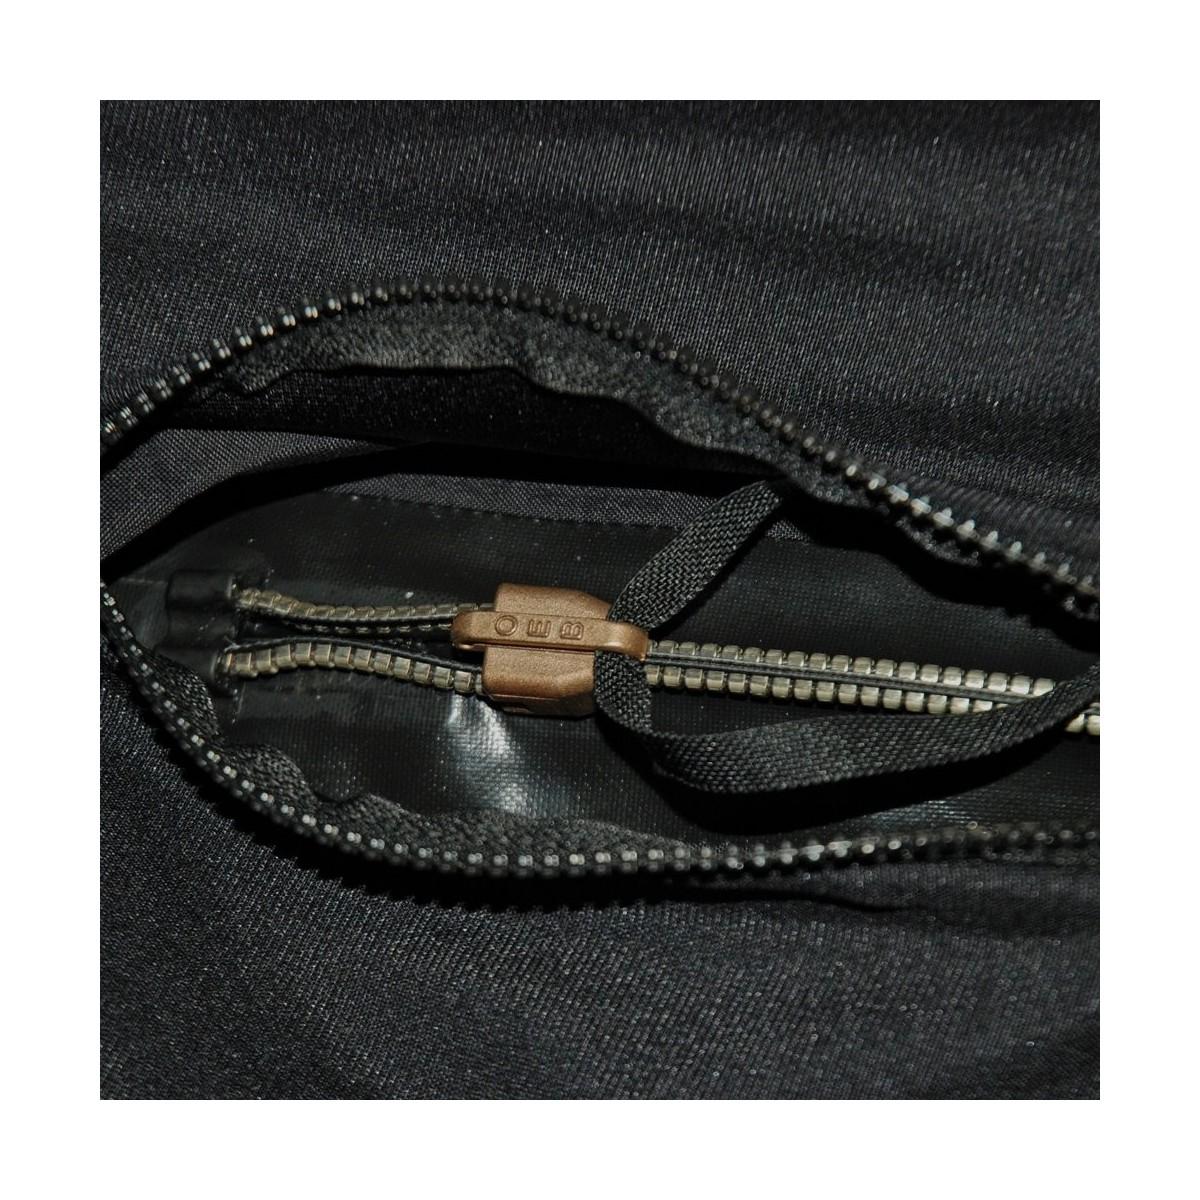 Aqua Lung 10-inch Relief Zipper